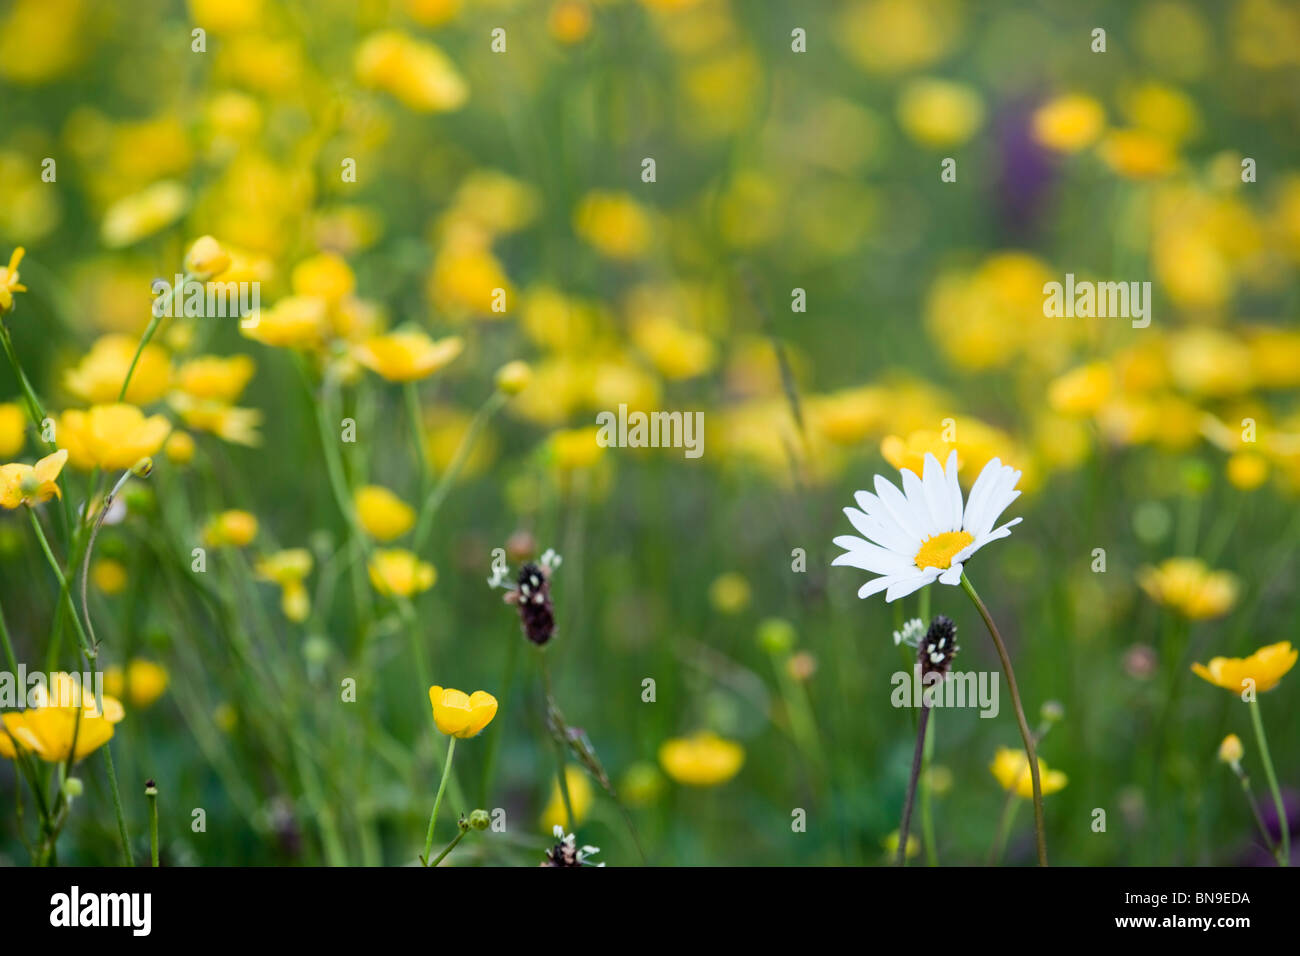 Oxeye daisy; Leucanthemum vulgare; amongst buttercups - Stock Image